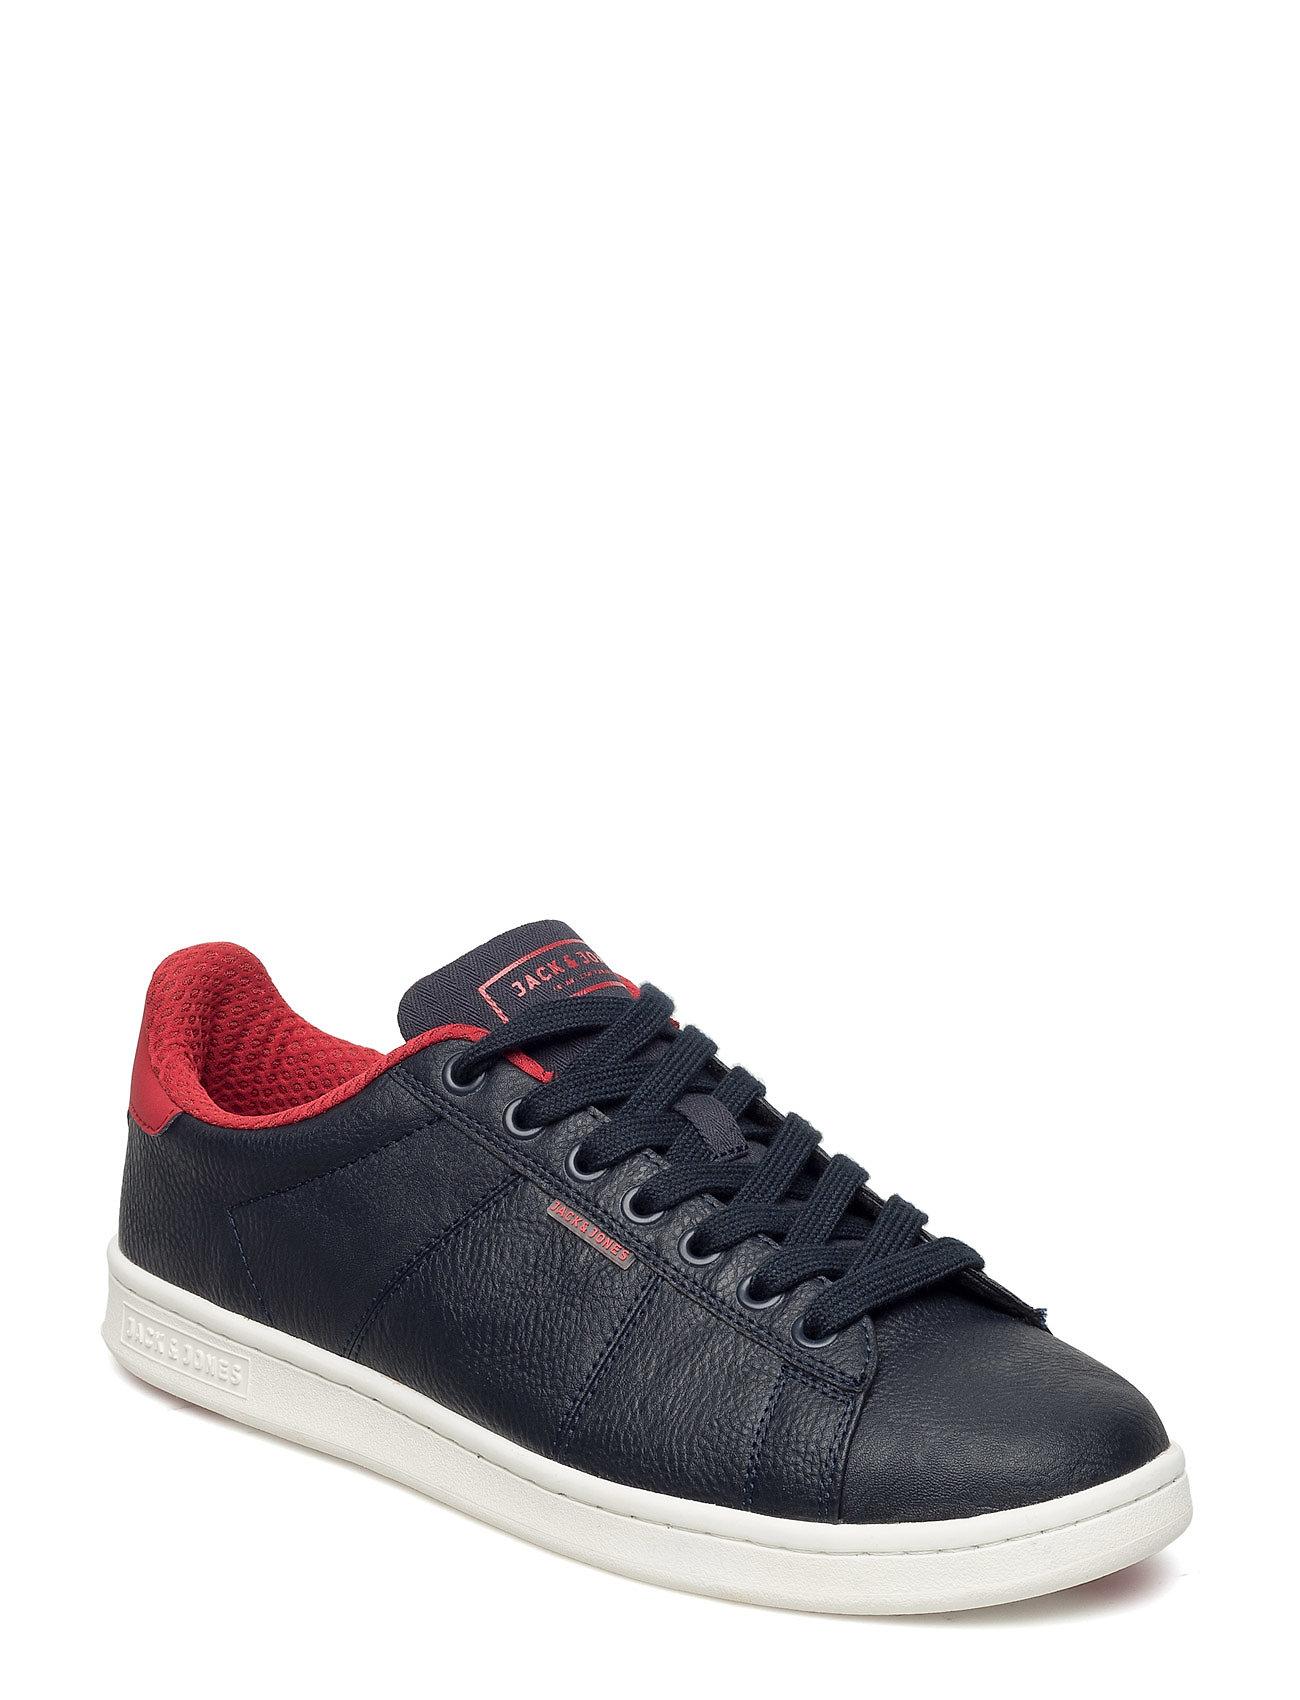 Jfwbane Pu Navy Blazer Jack & Jones Sneakers til Herrer i Navy Blazer